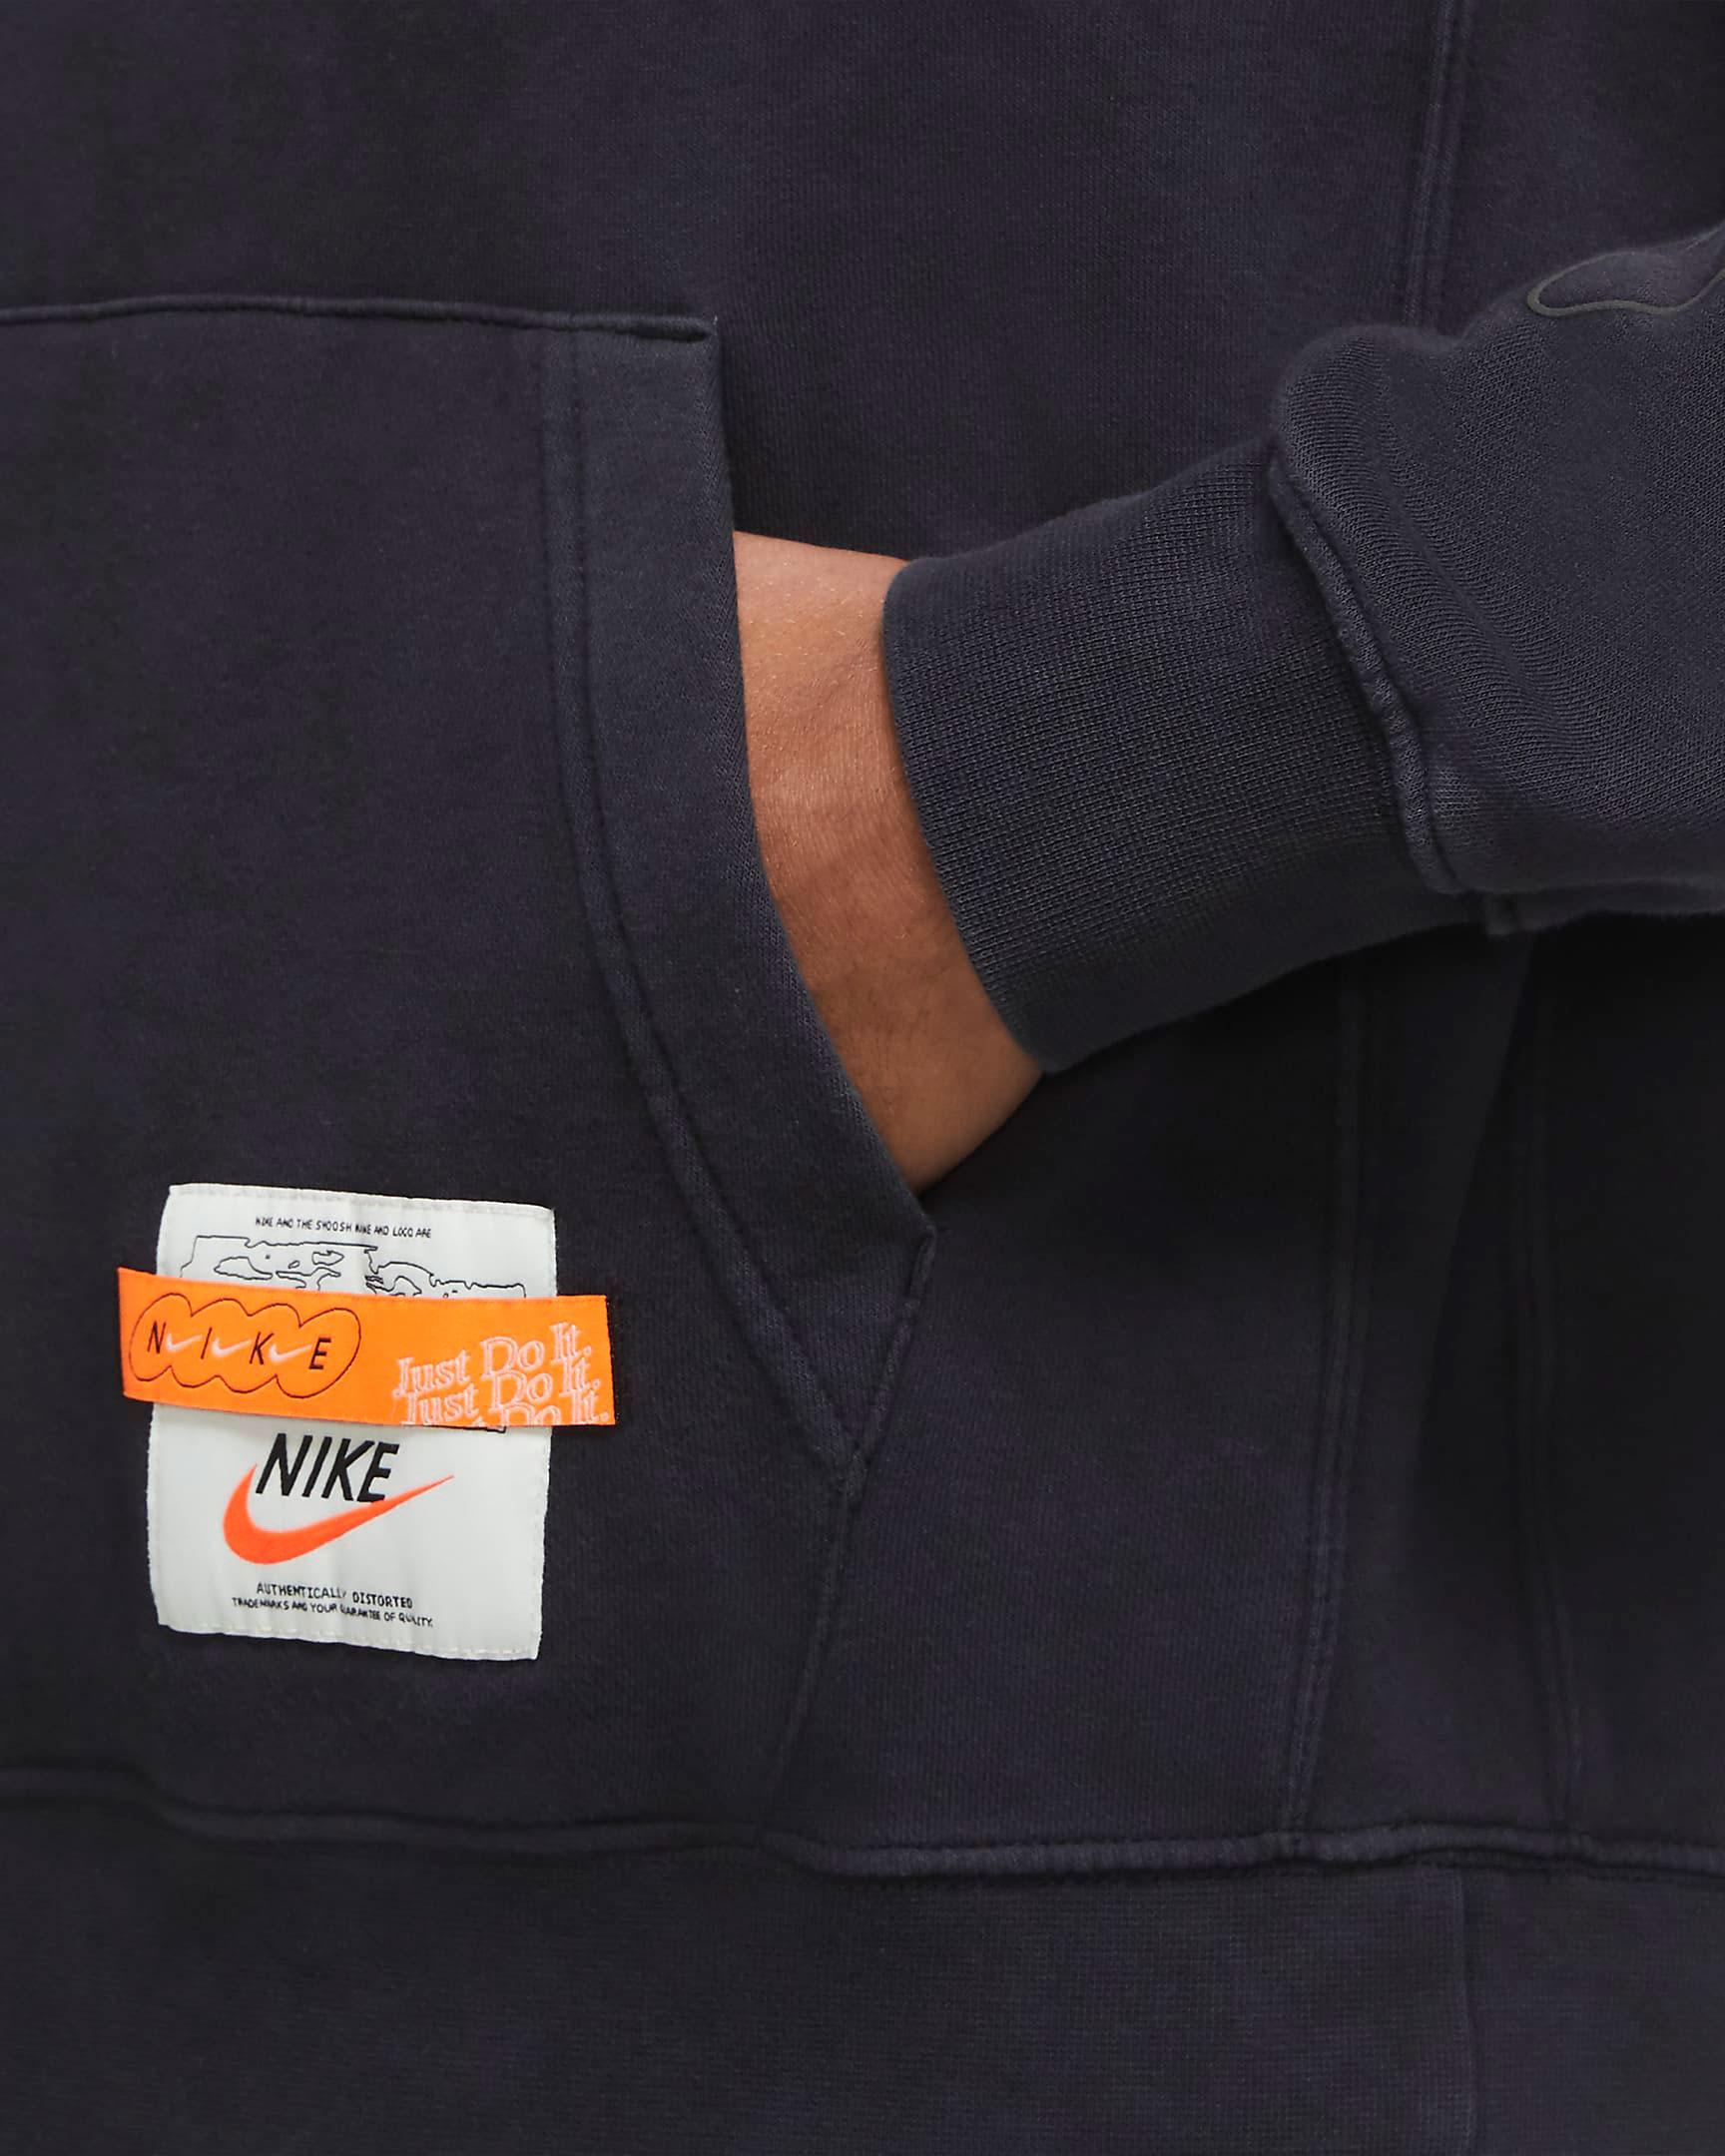 nike-air-force-1-orange-skeleton-matching-hoodie-2